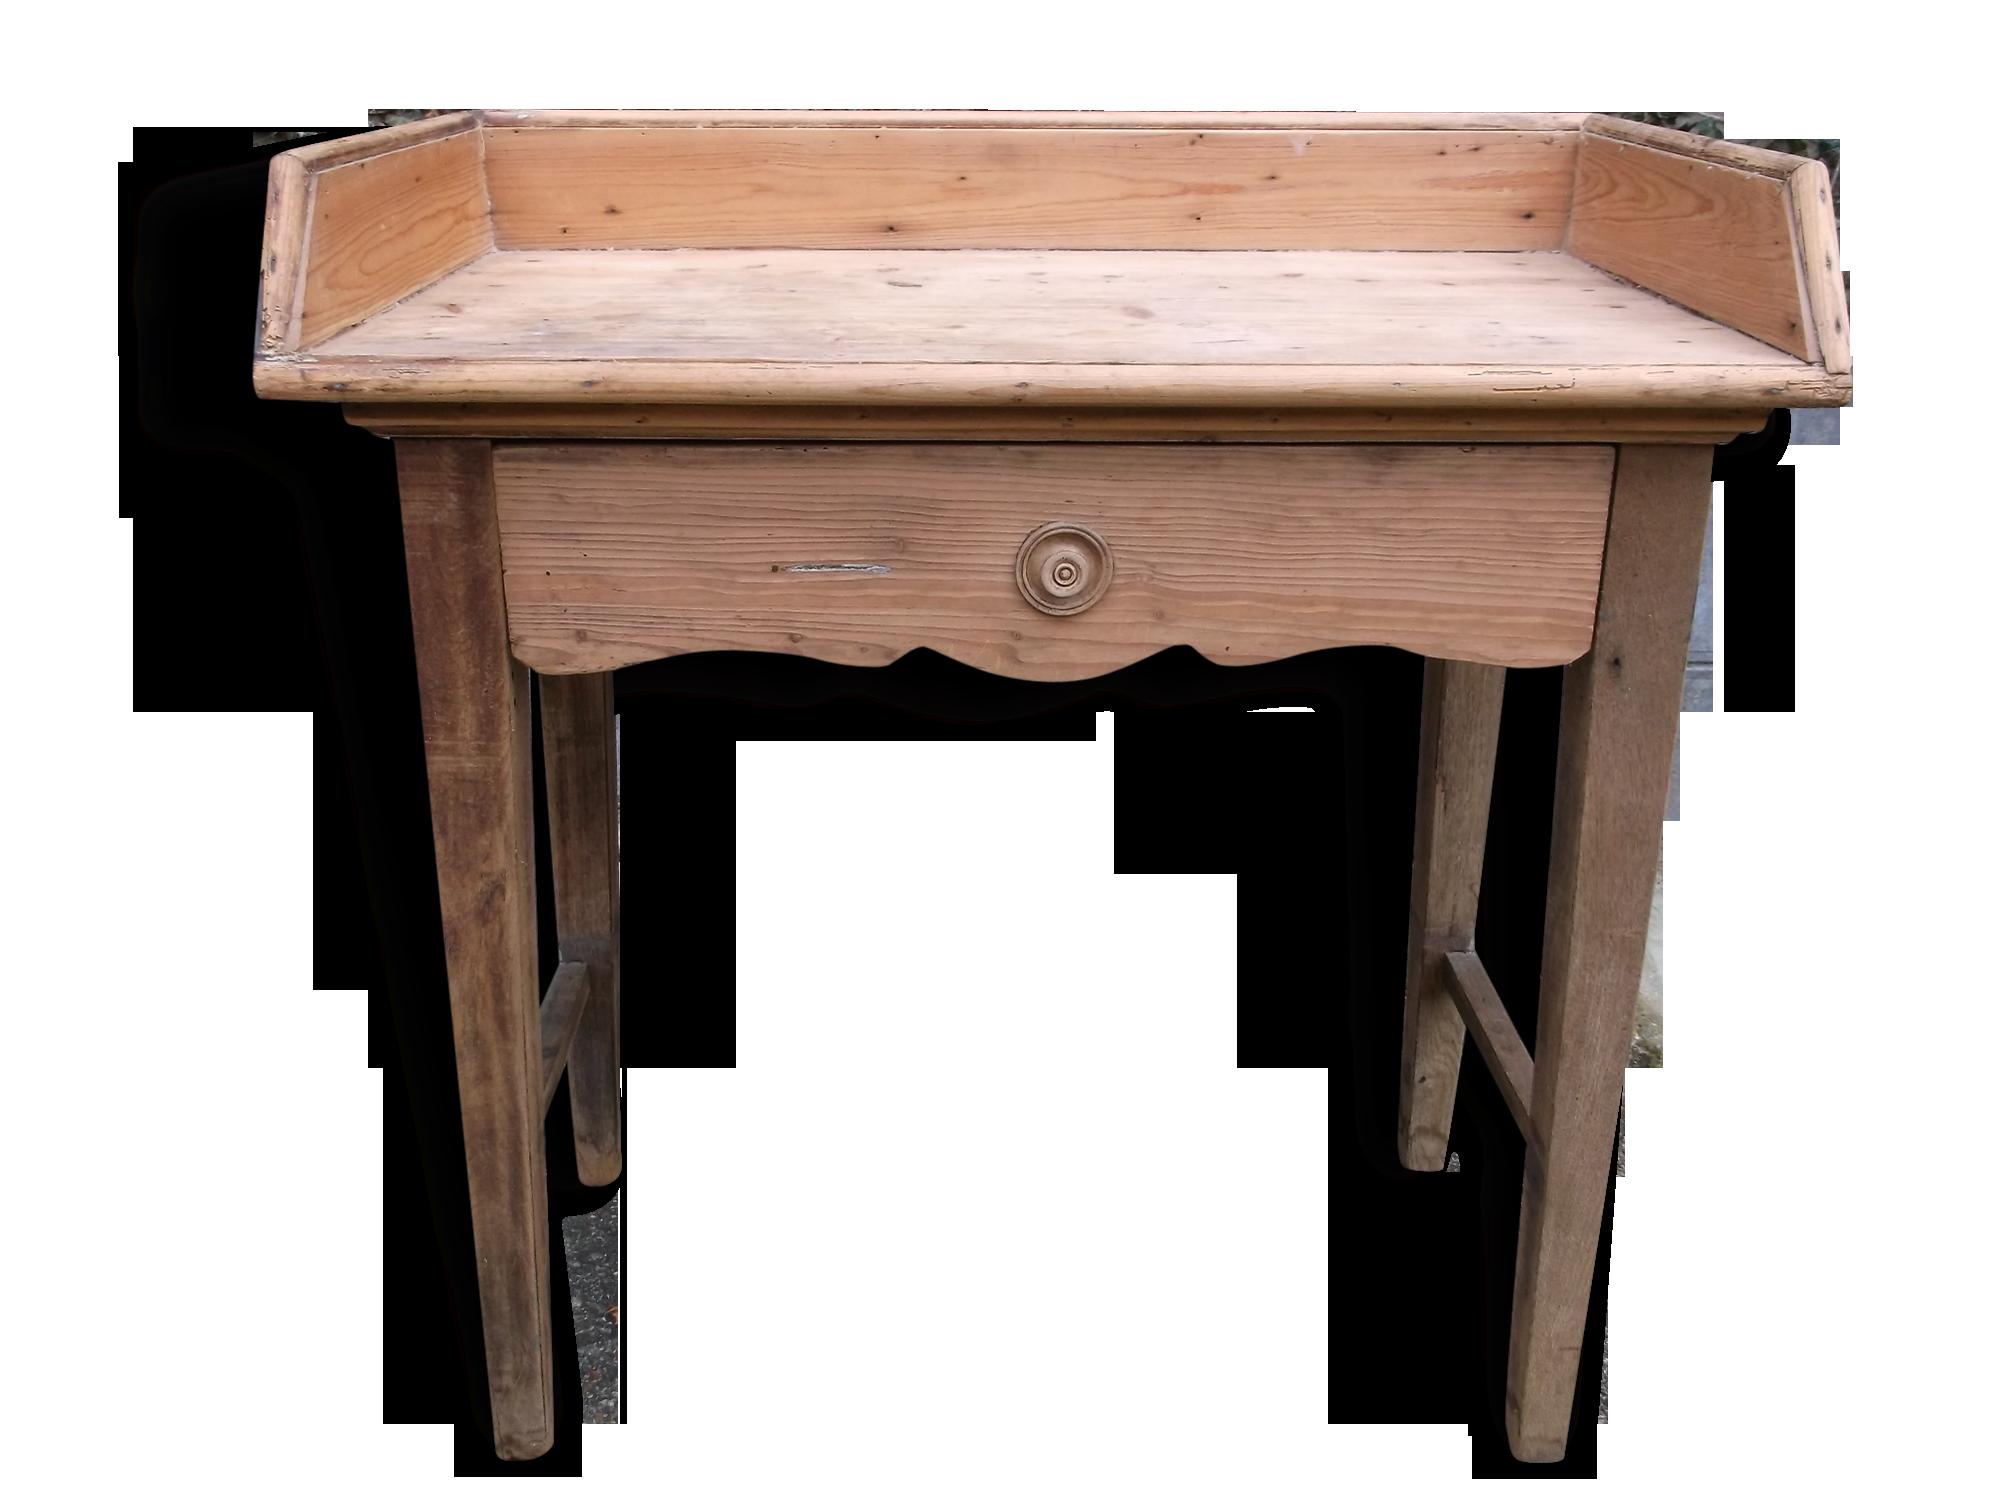 Bureau bois massif ancien table chene massif rustique beautiful